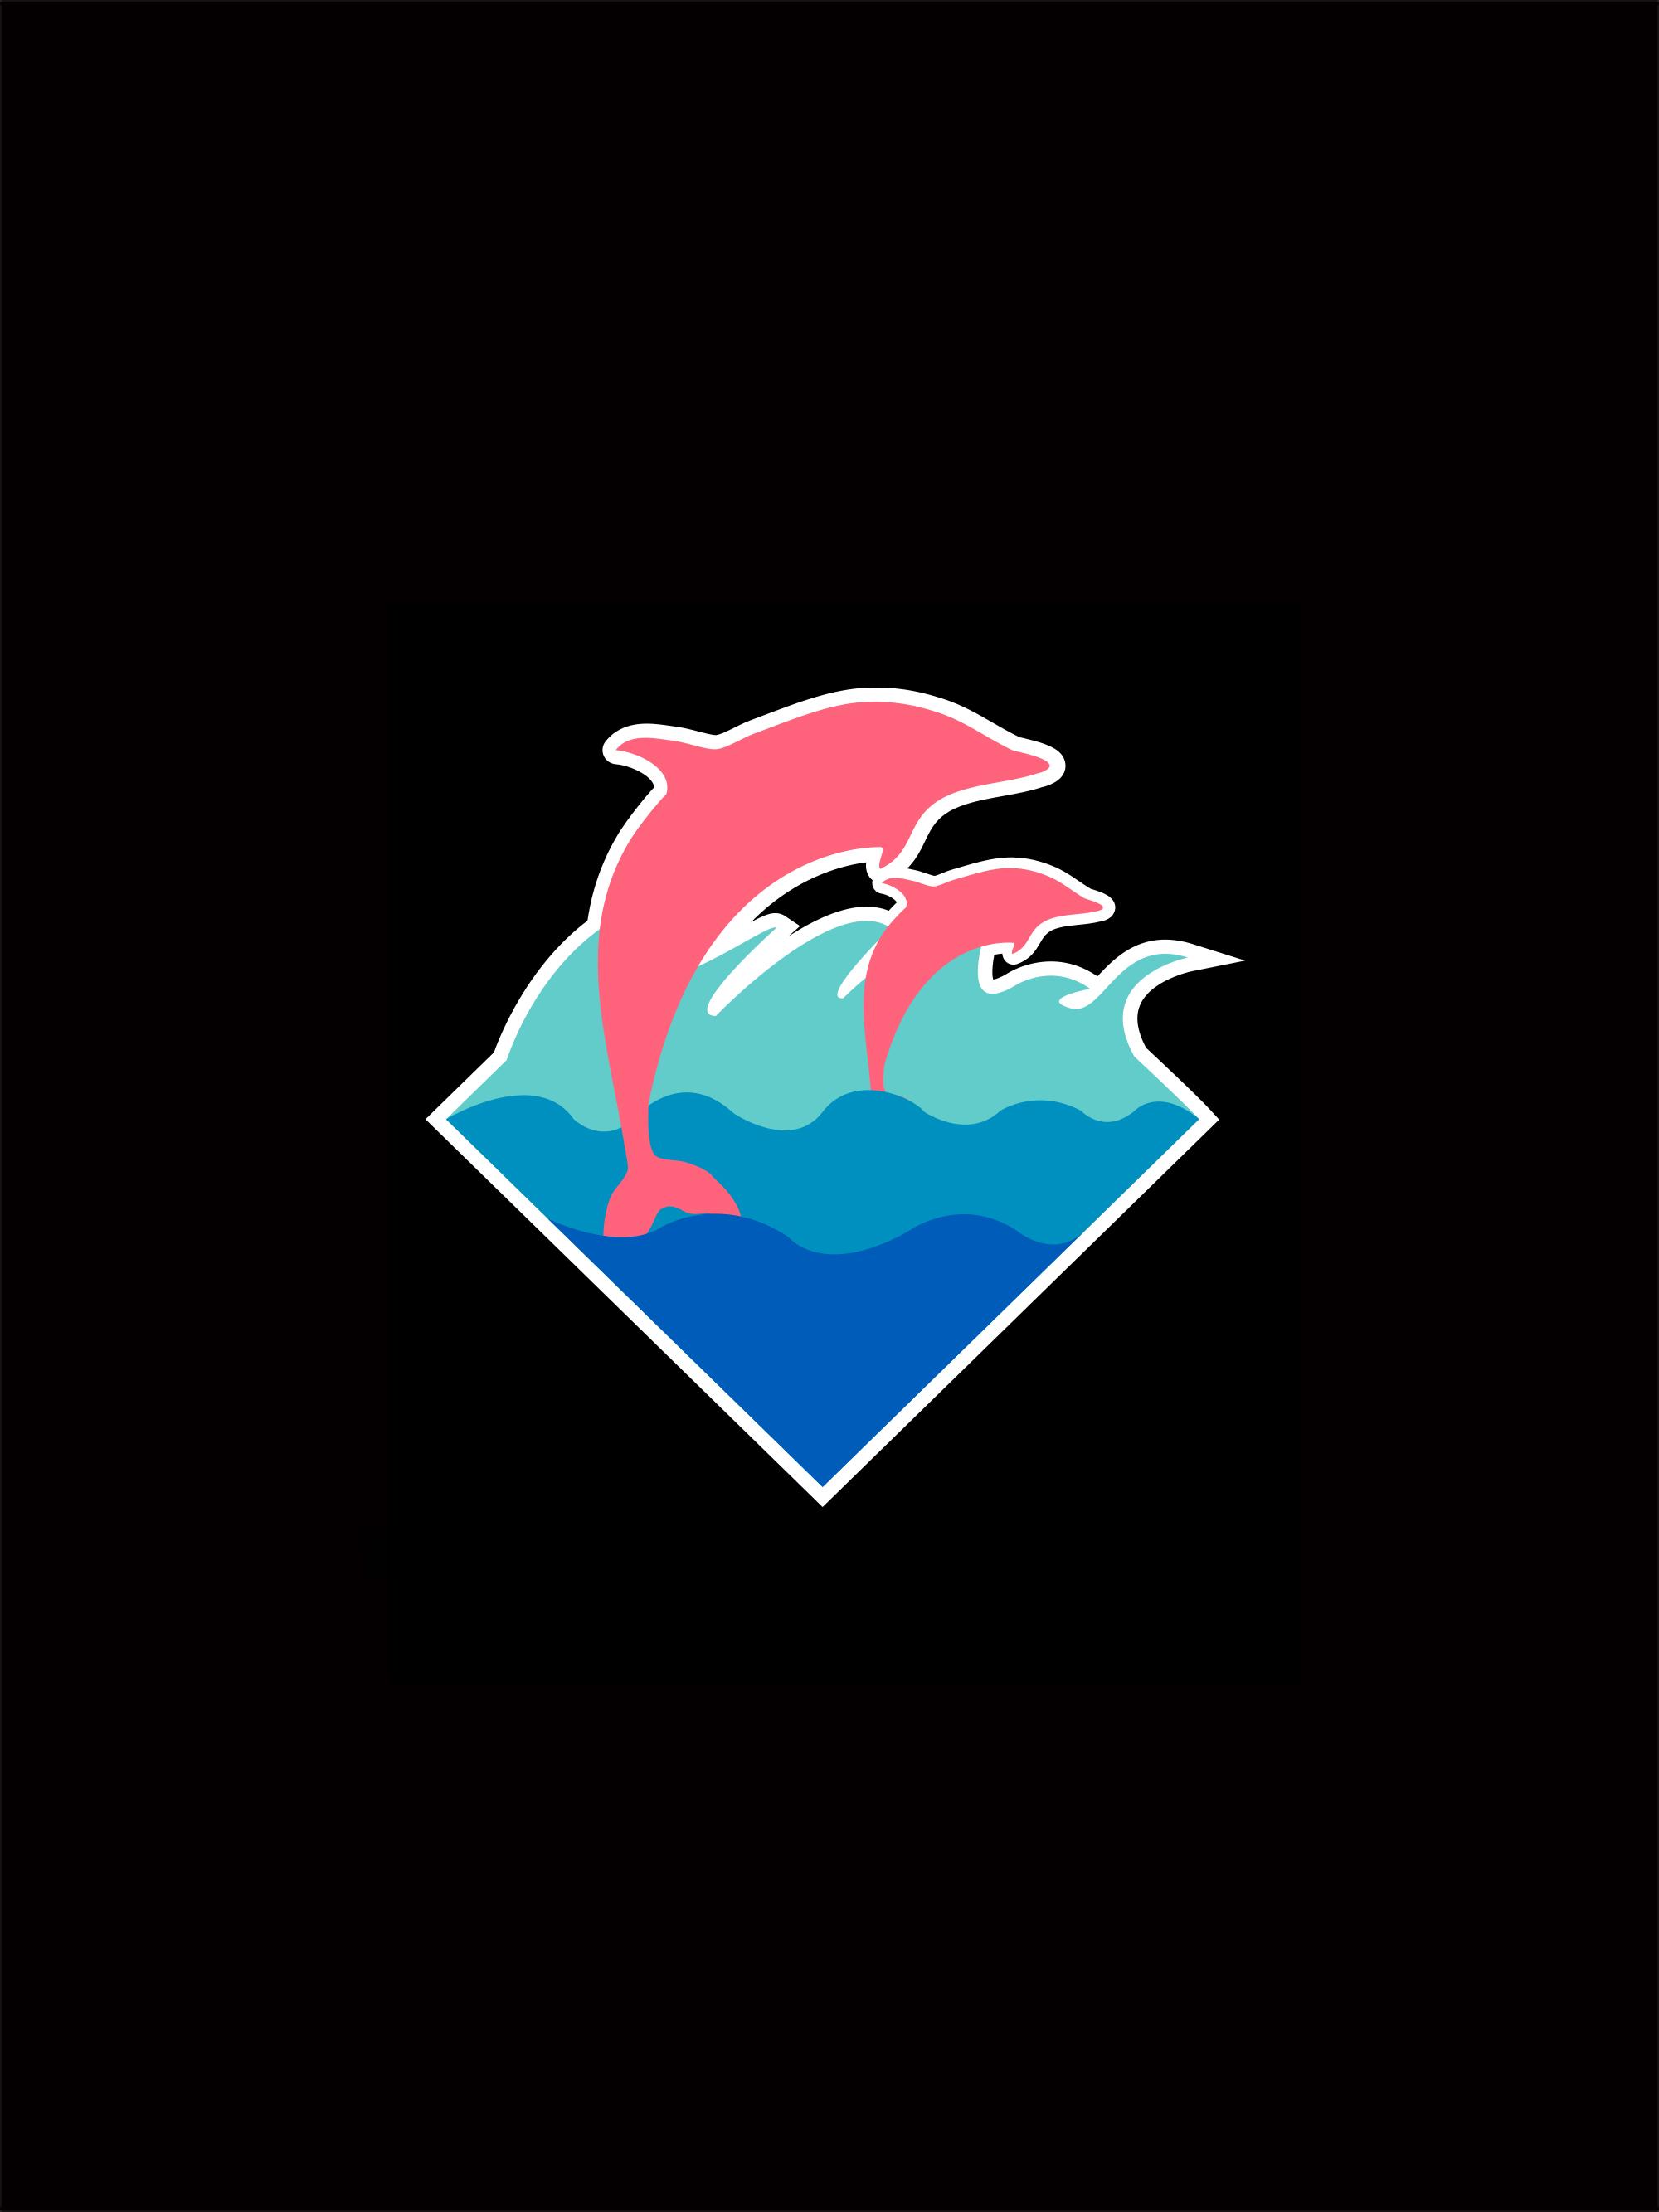 Pink Dolphin Wallpaper Sf Wallpaper